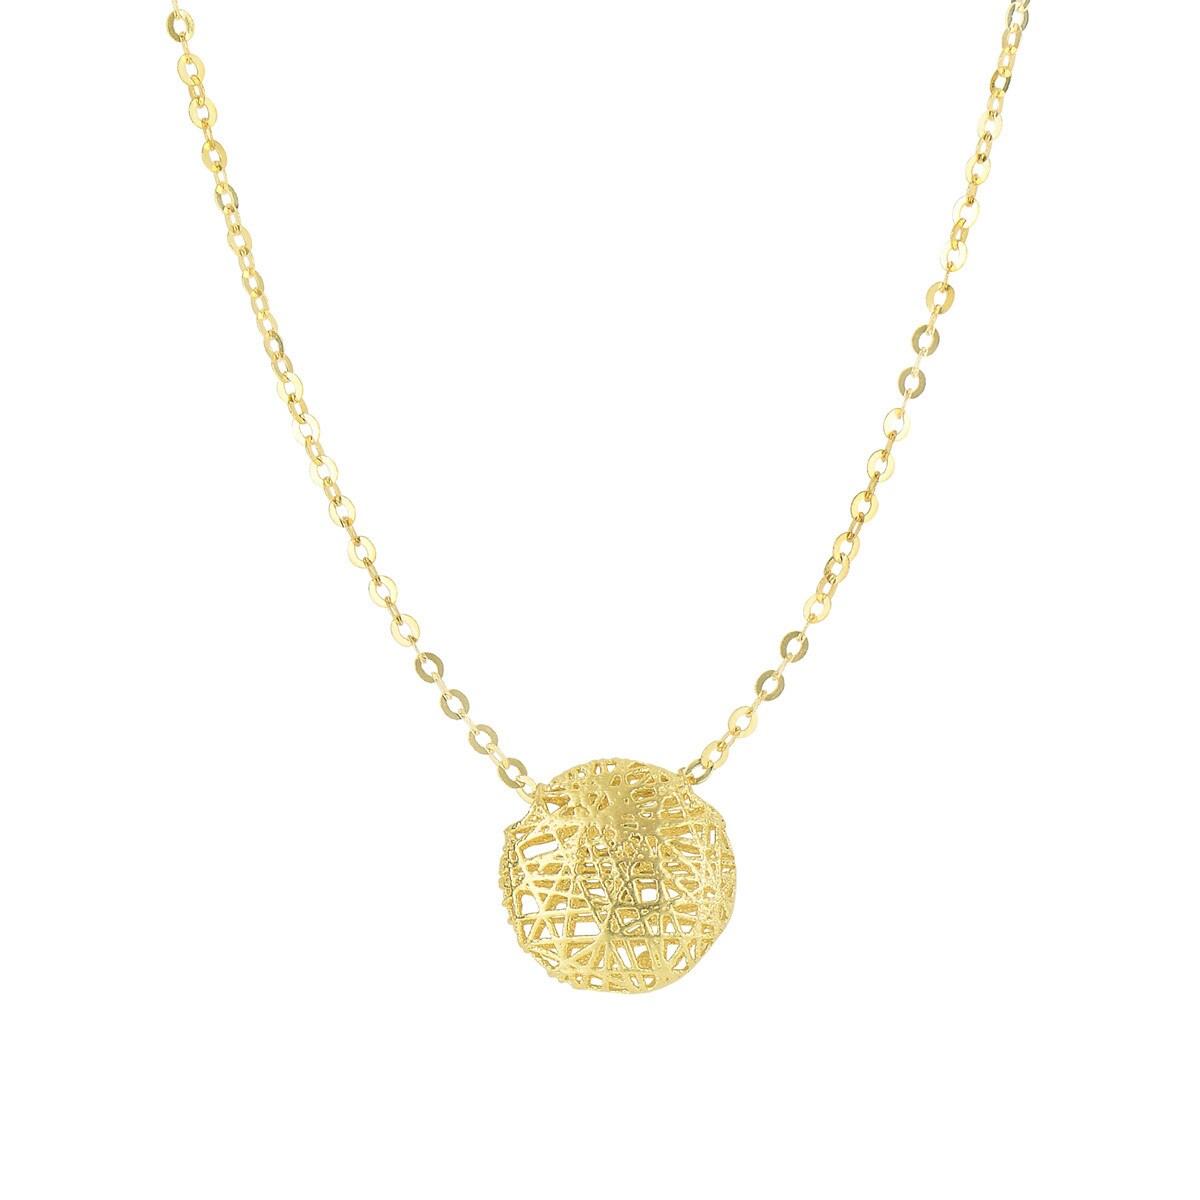 14 Karat Yellow Gold 19x19mm Mesh Ball Necklace, 17 Inche...